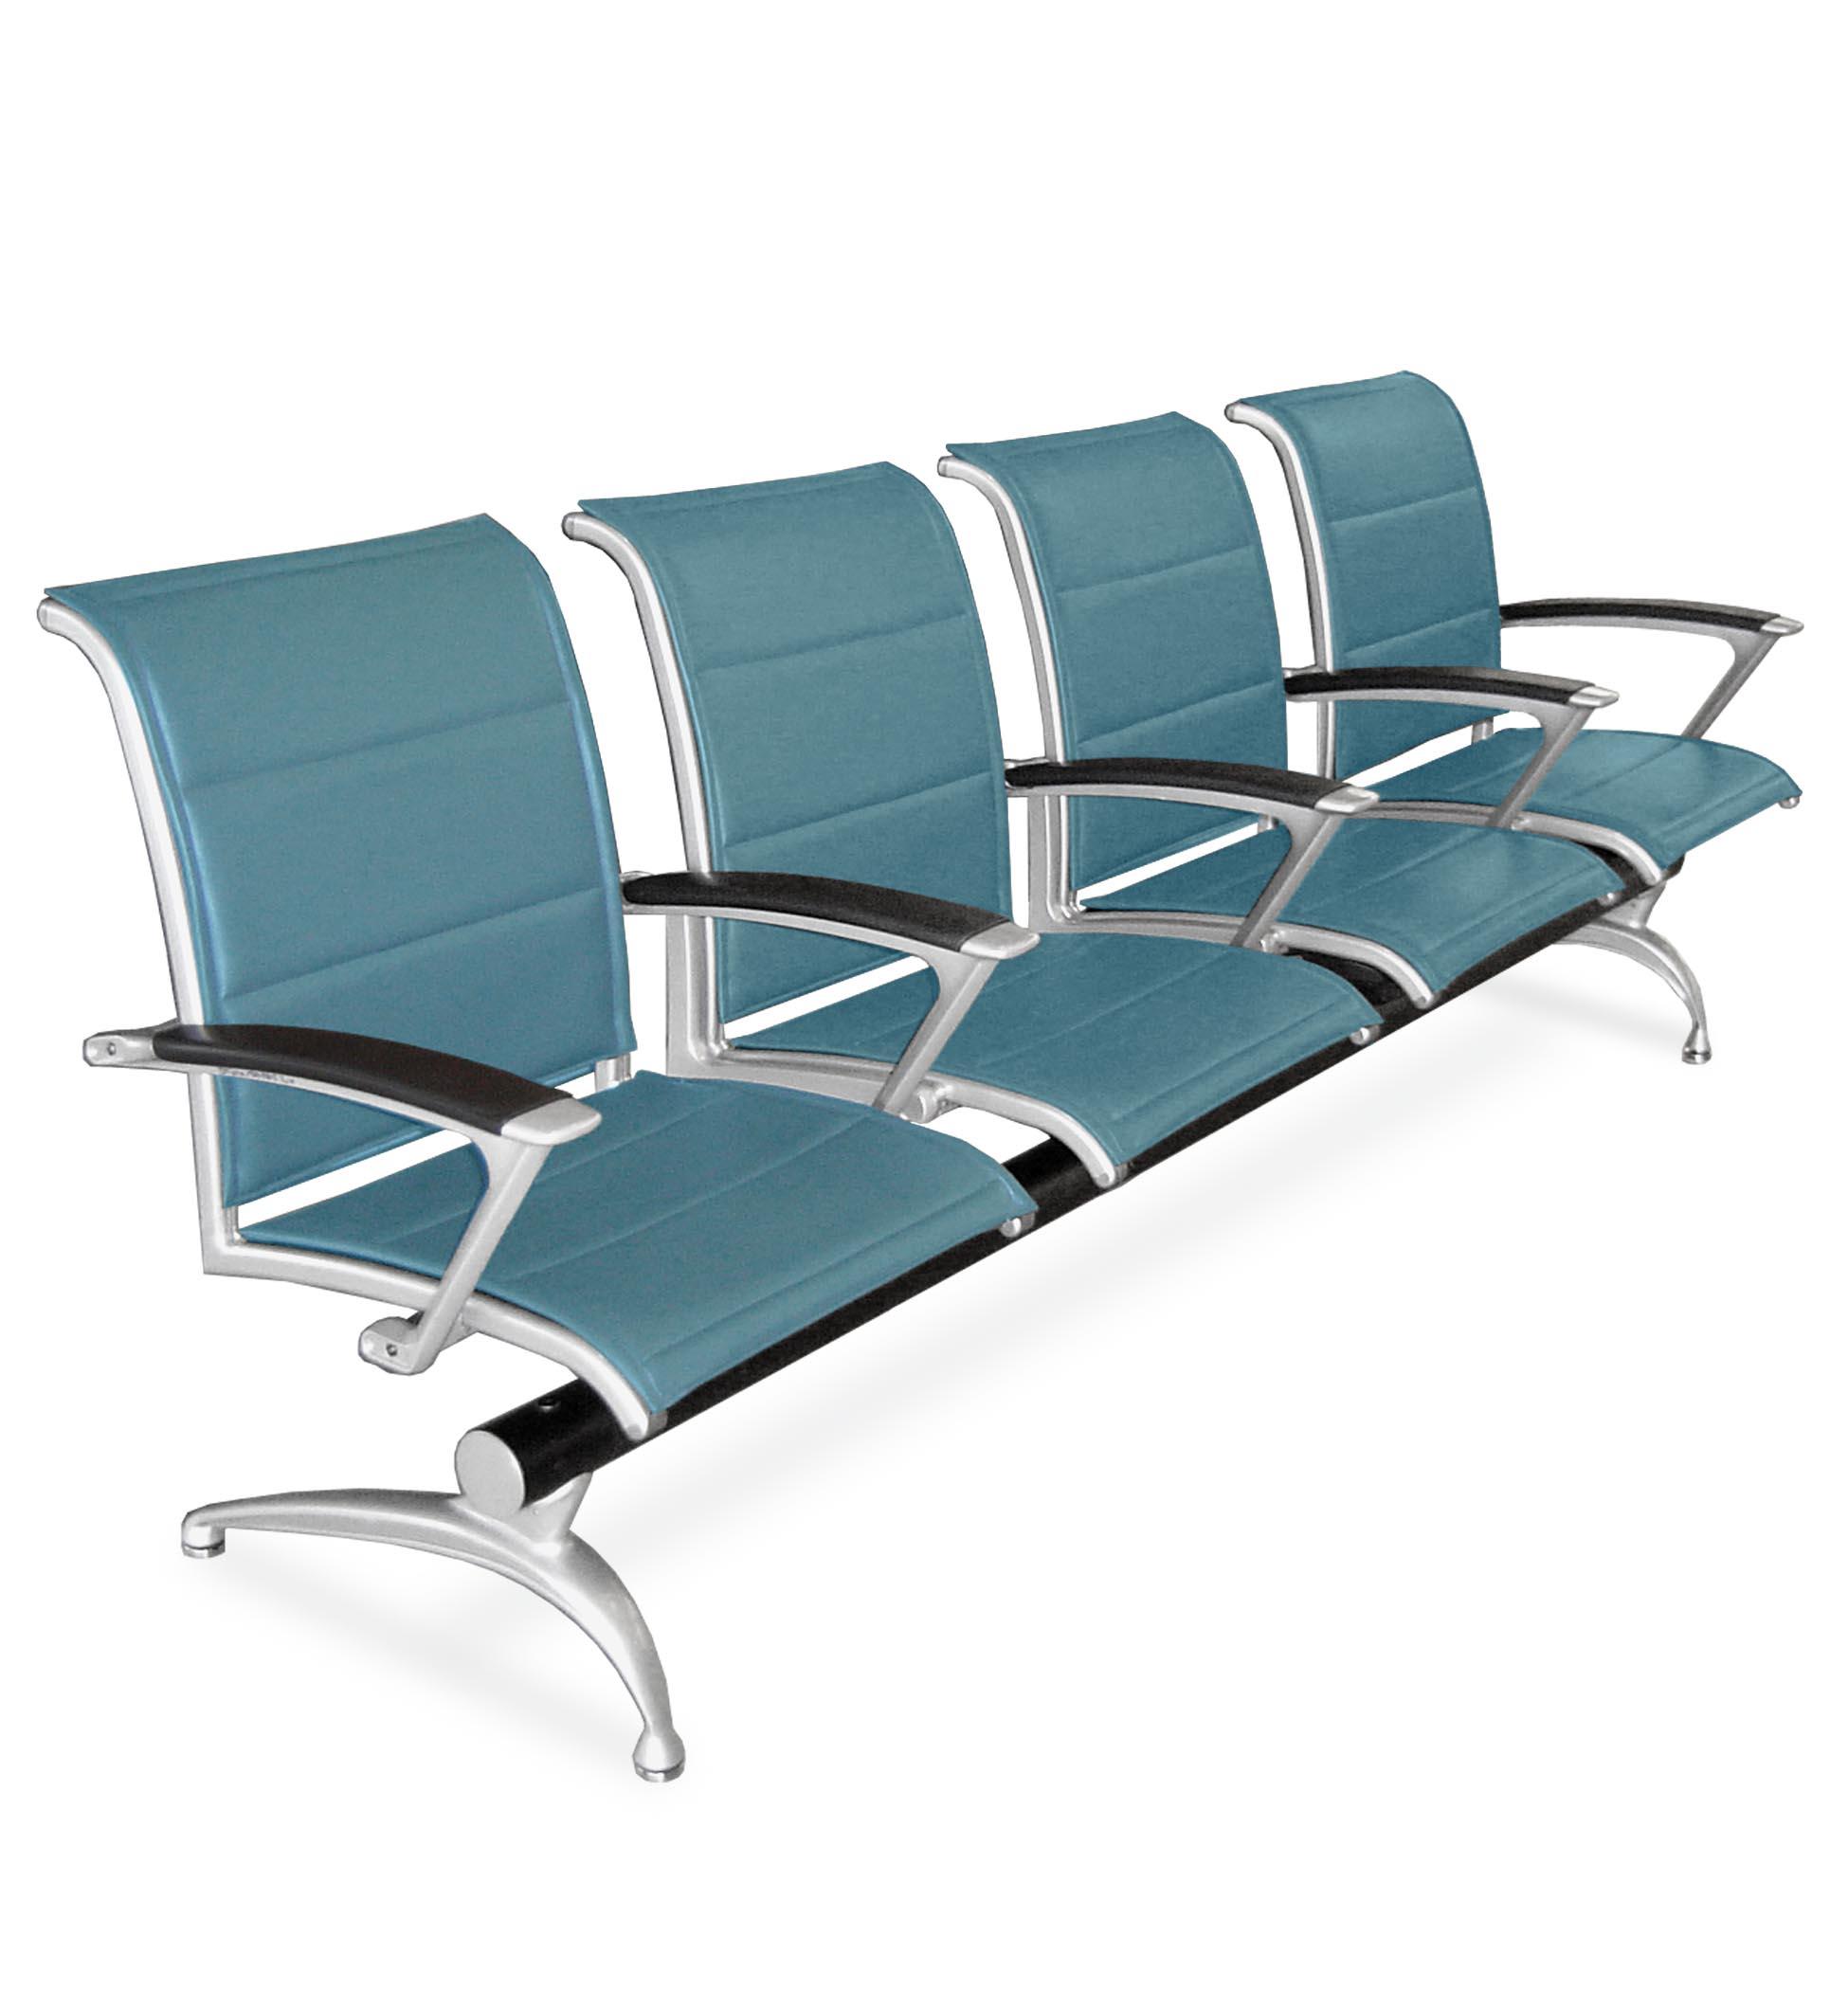 CX Tandem Seating, on Designer Pages